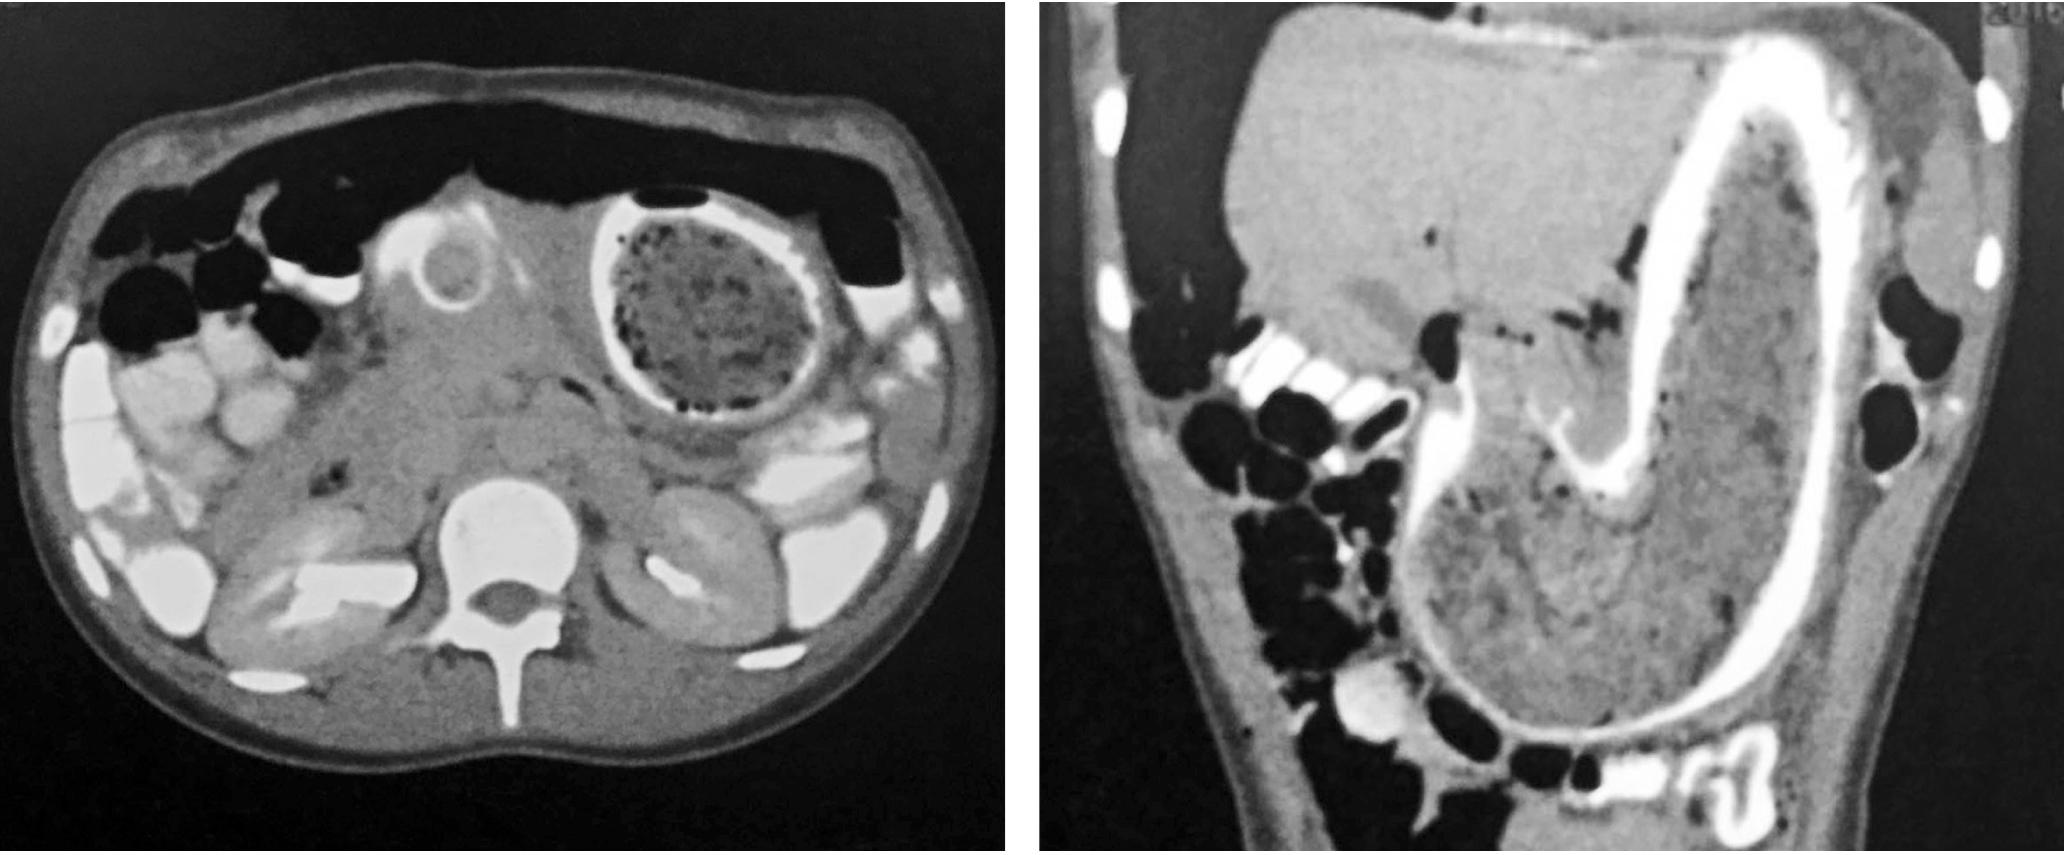 Figura 1. TAC de abdomen con doble contraste.